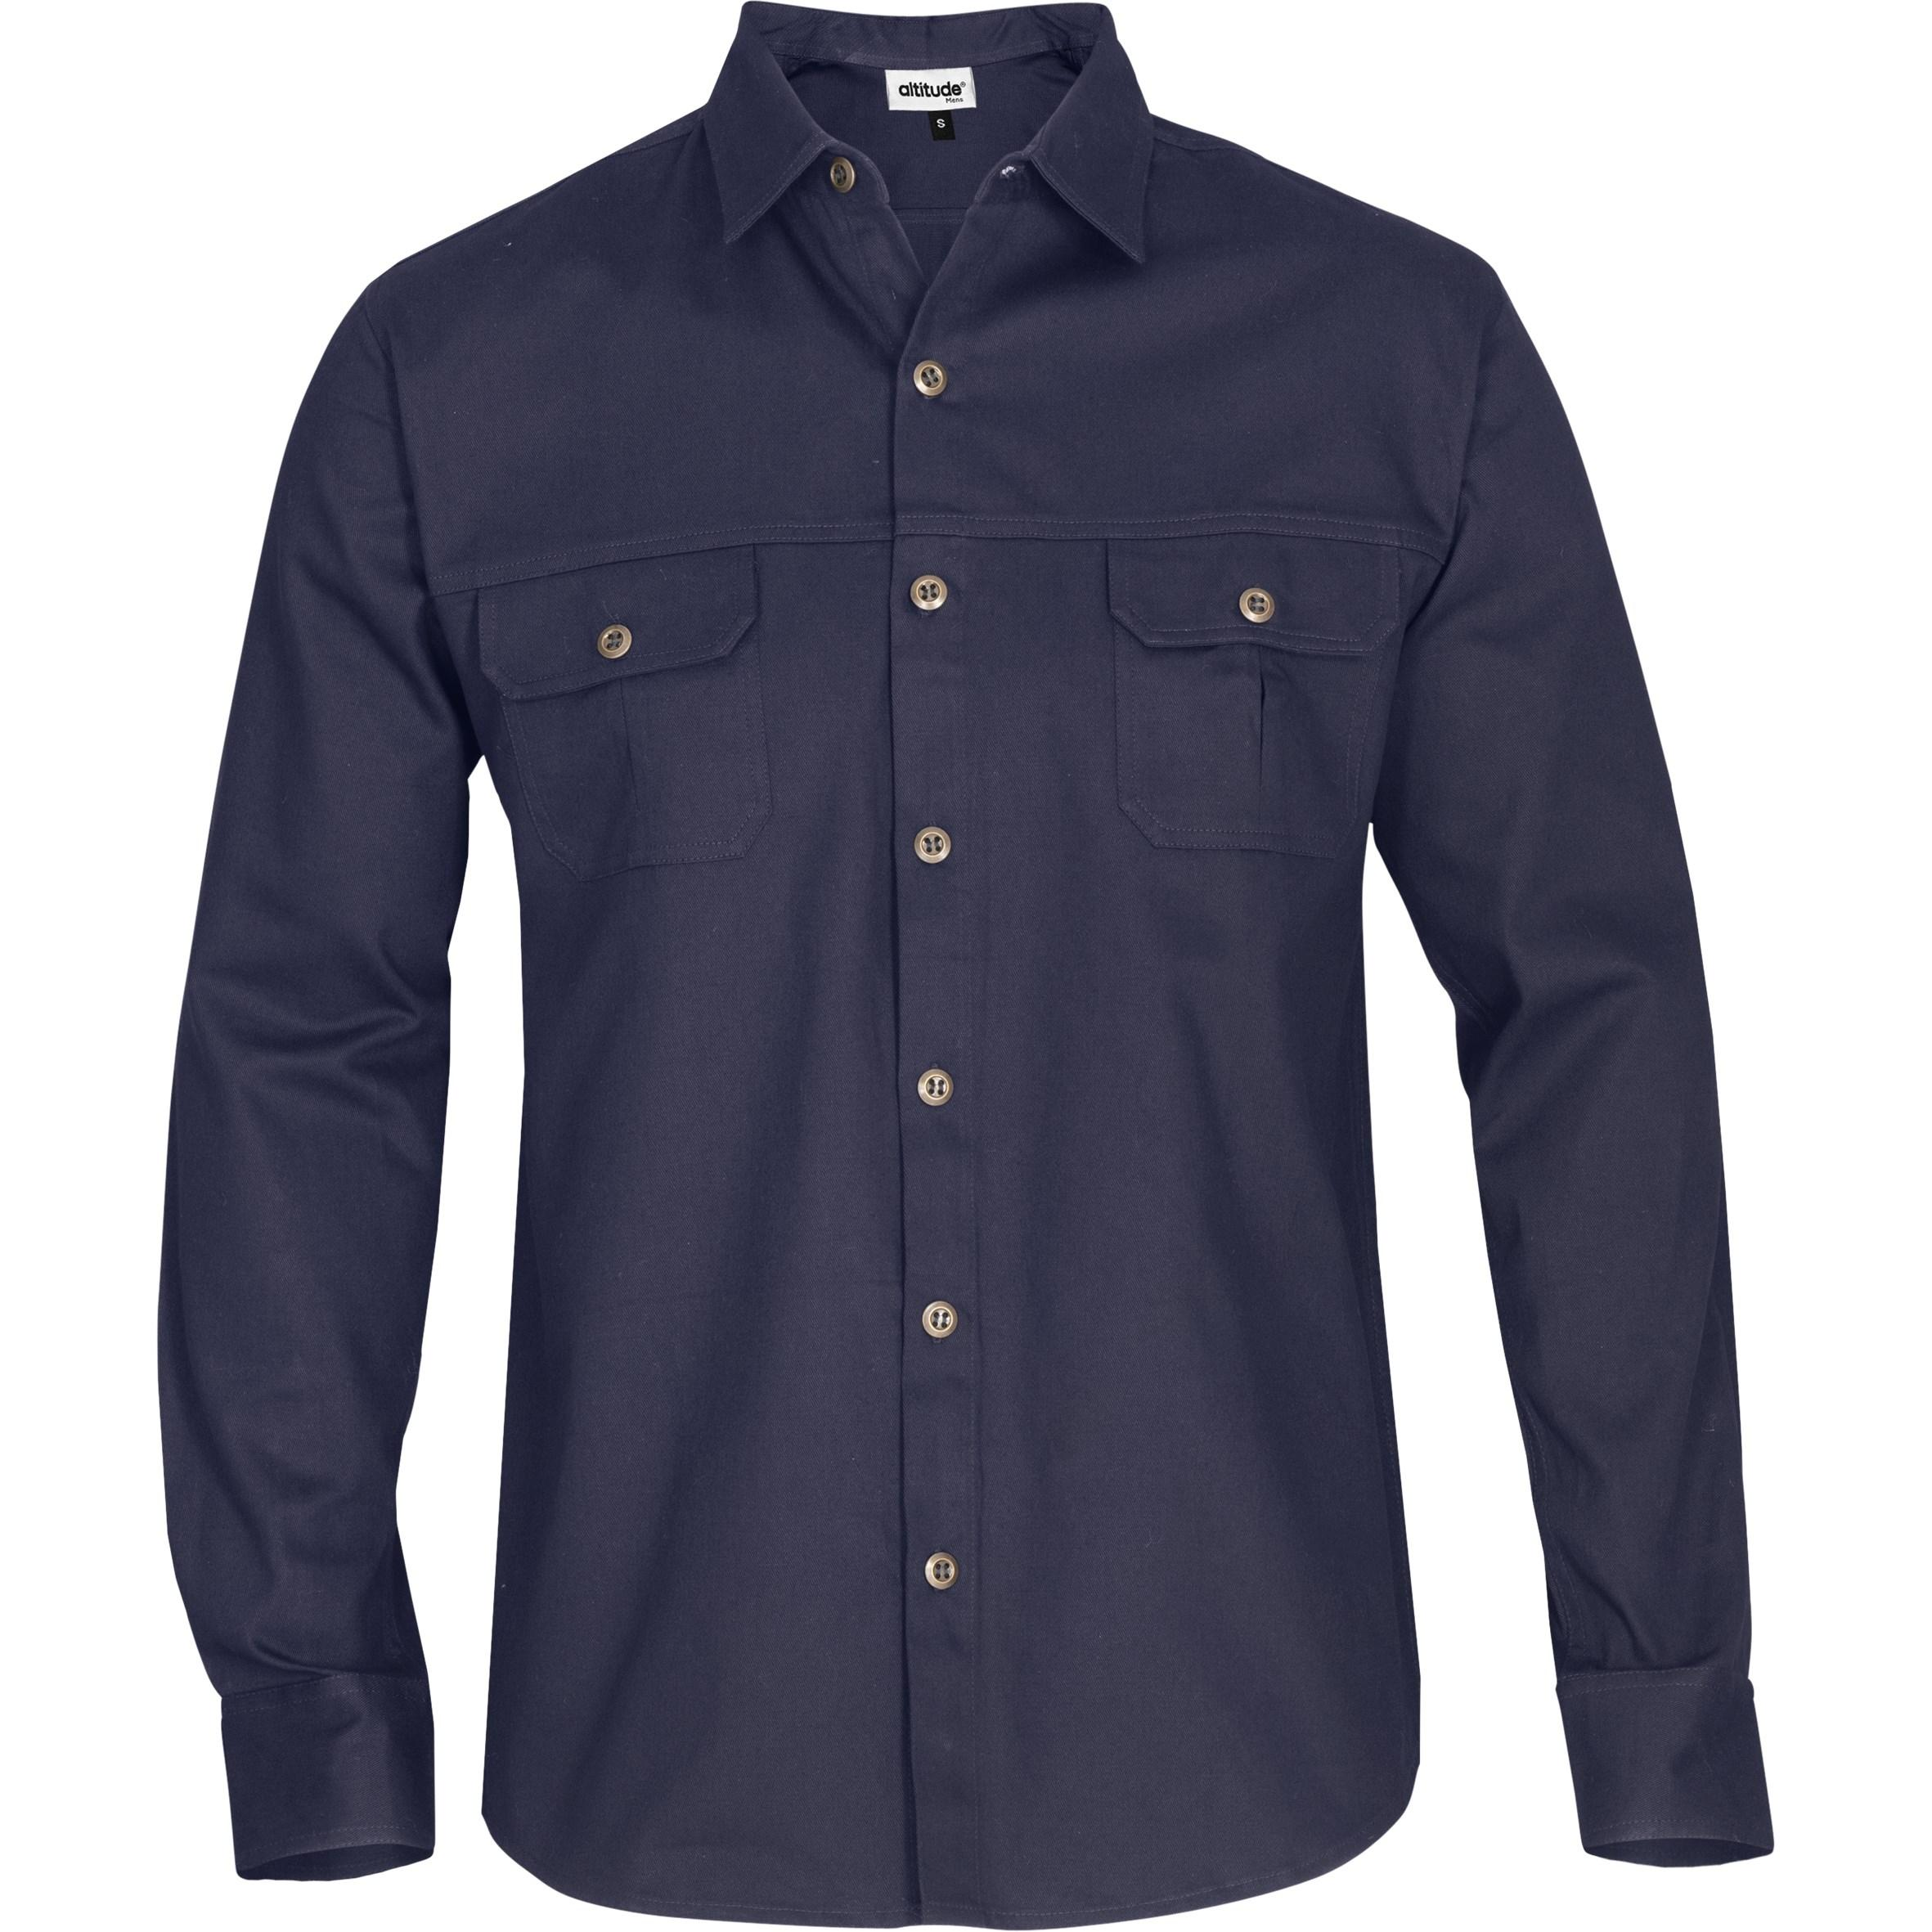 Mens Long Sleeve Oryx Bush Shirt - Navy Only